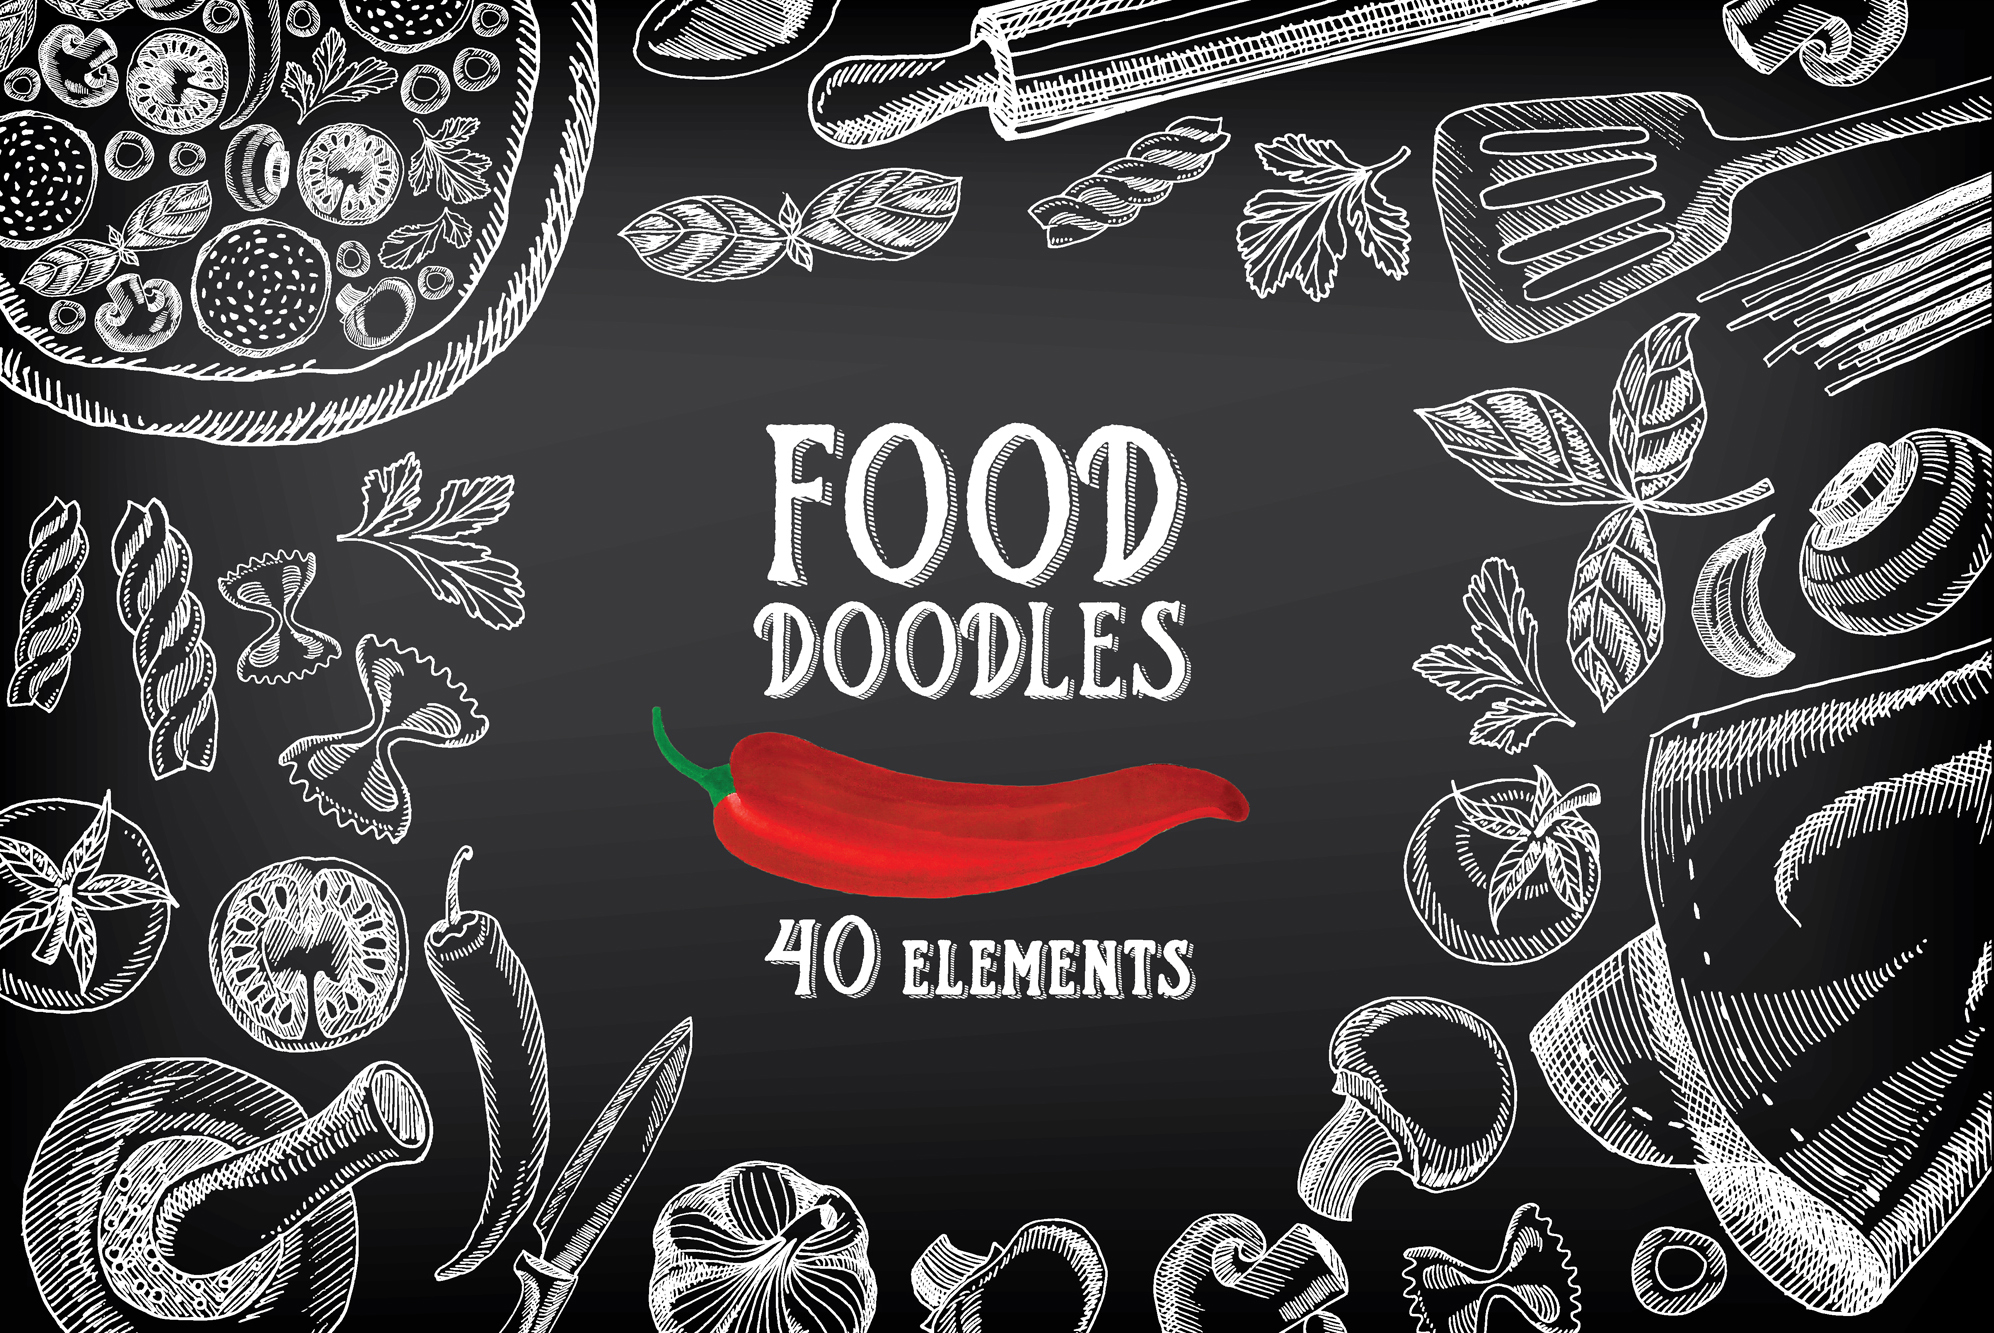 Barcelona Logo 3d Wallpaper Food Doodles 40 Elements Illustrations On Creative Market